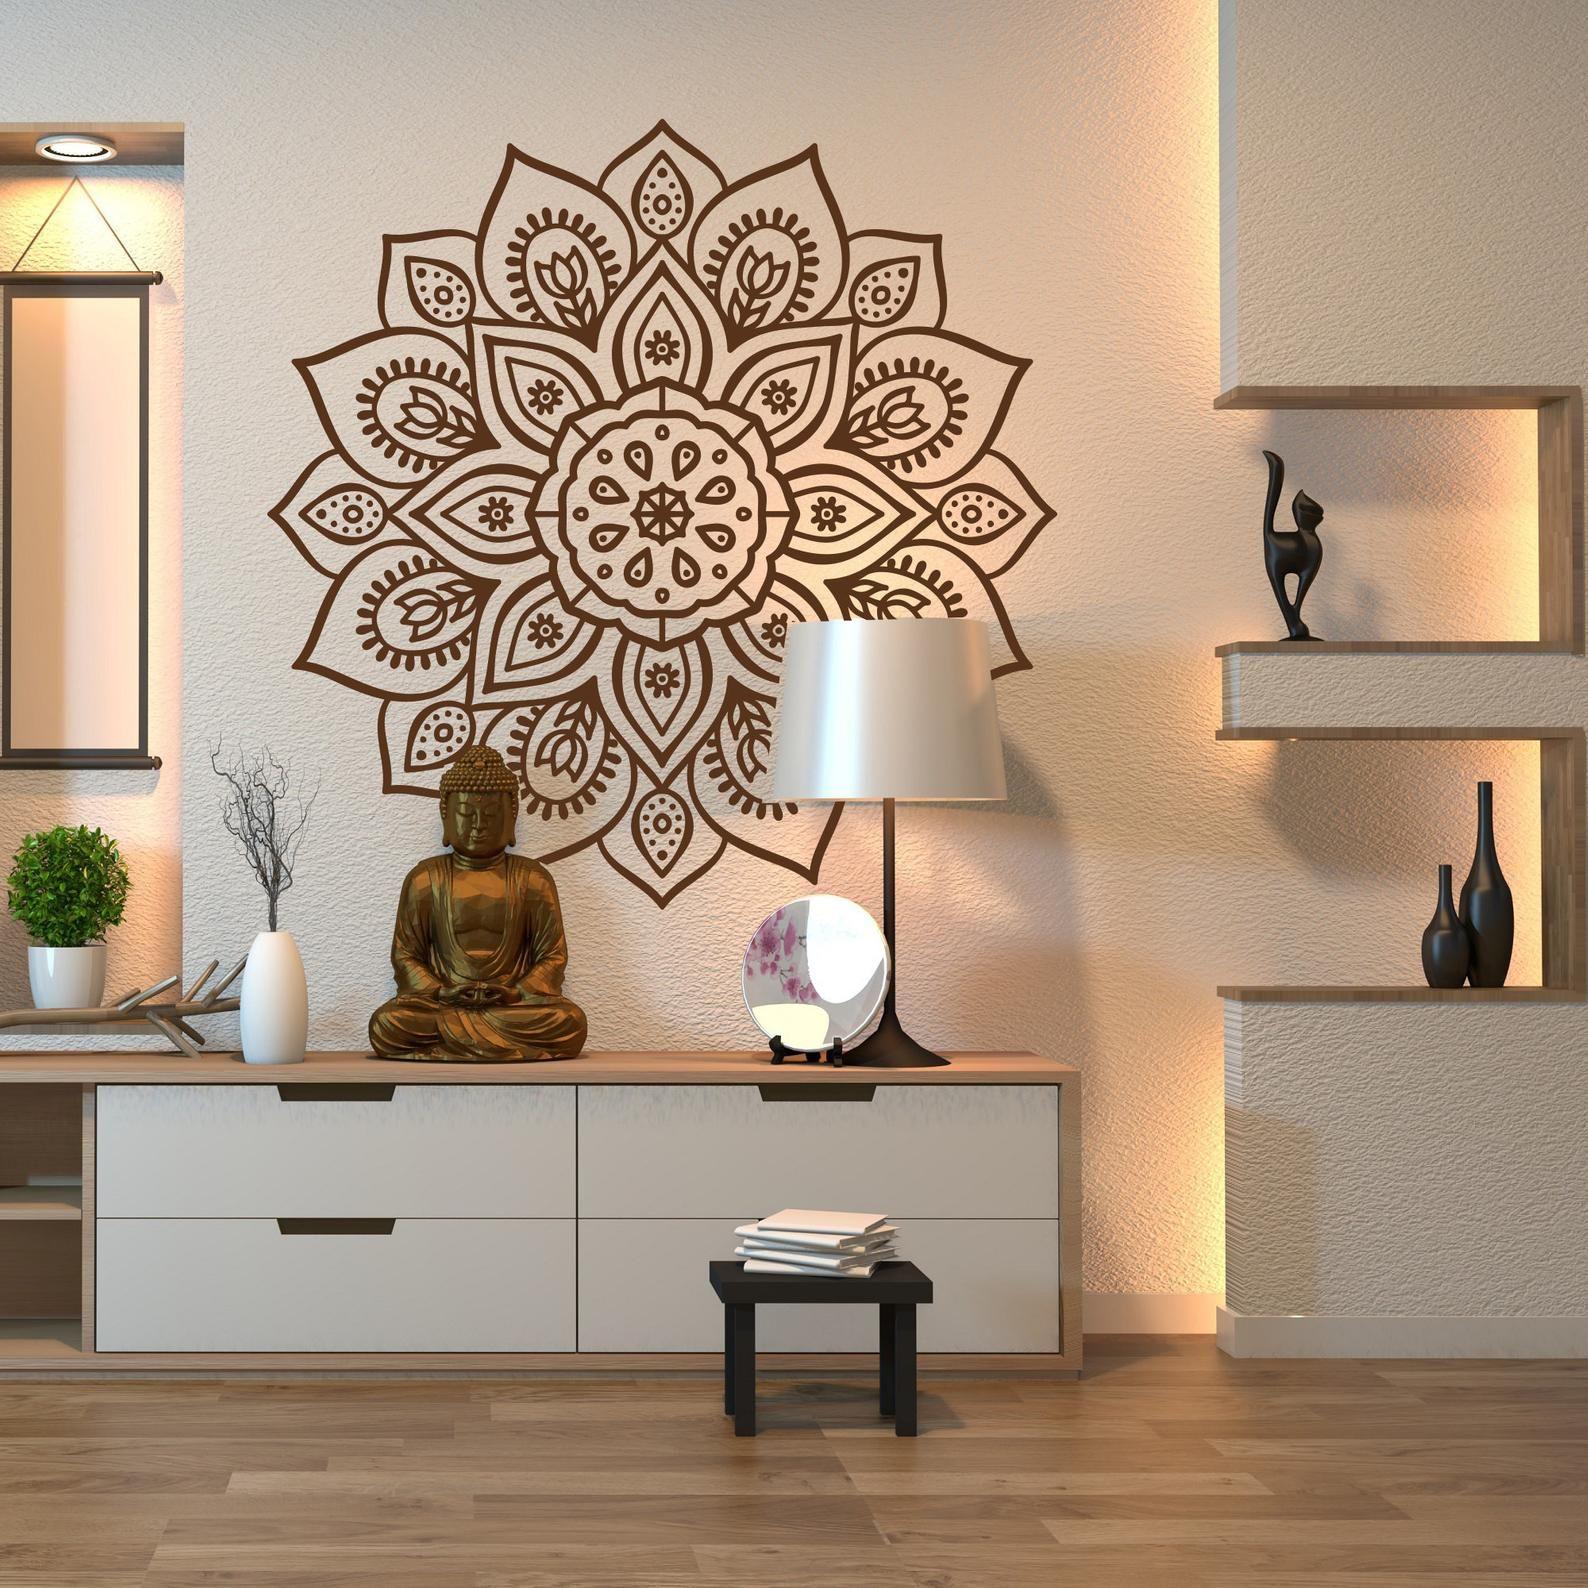 Trendy Decor Wall Painting House Ideas Stylish Wall Art Wall Painting Decor Wall Paint Designs